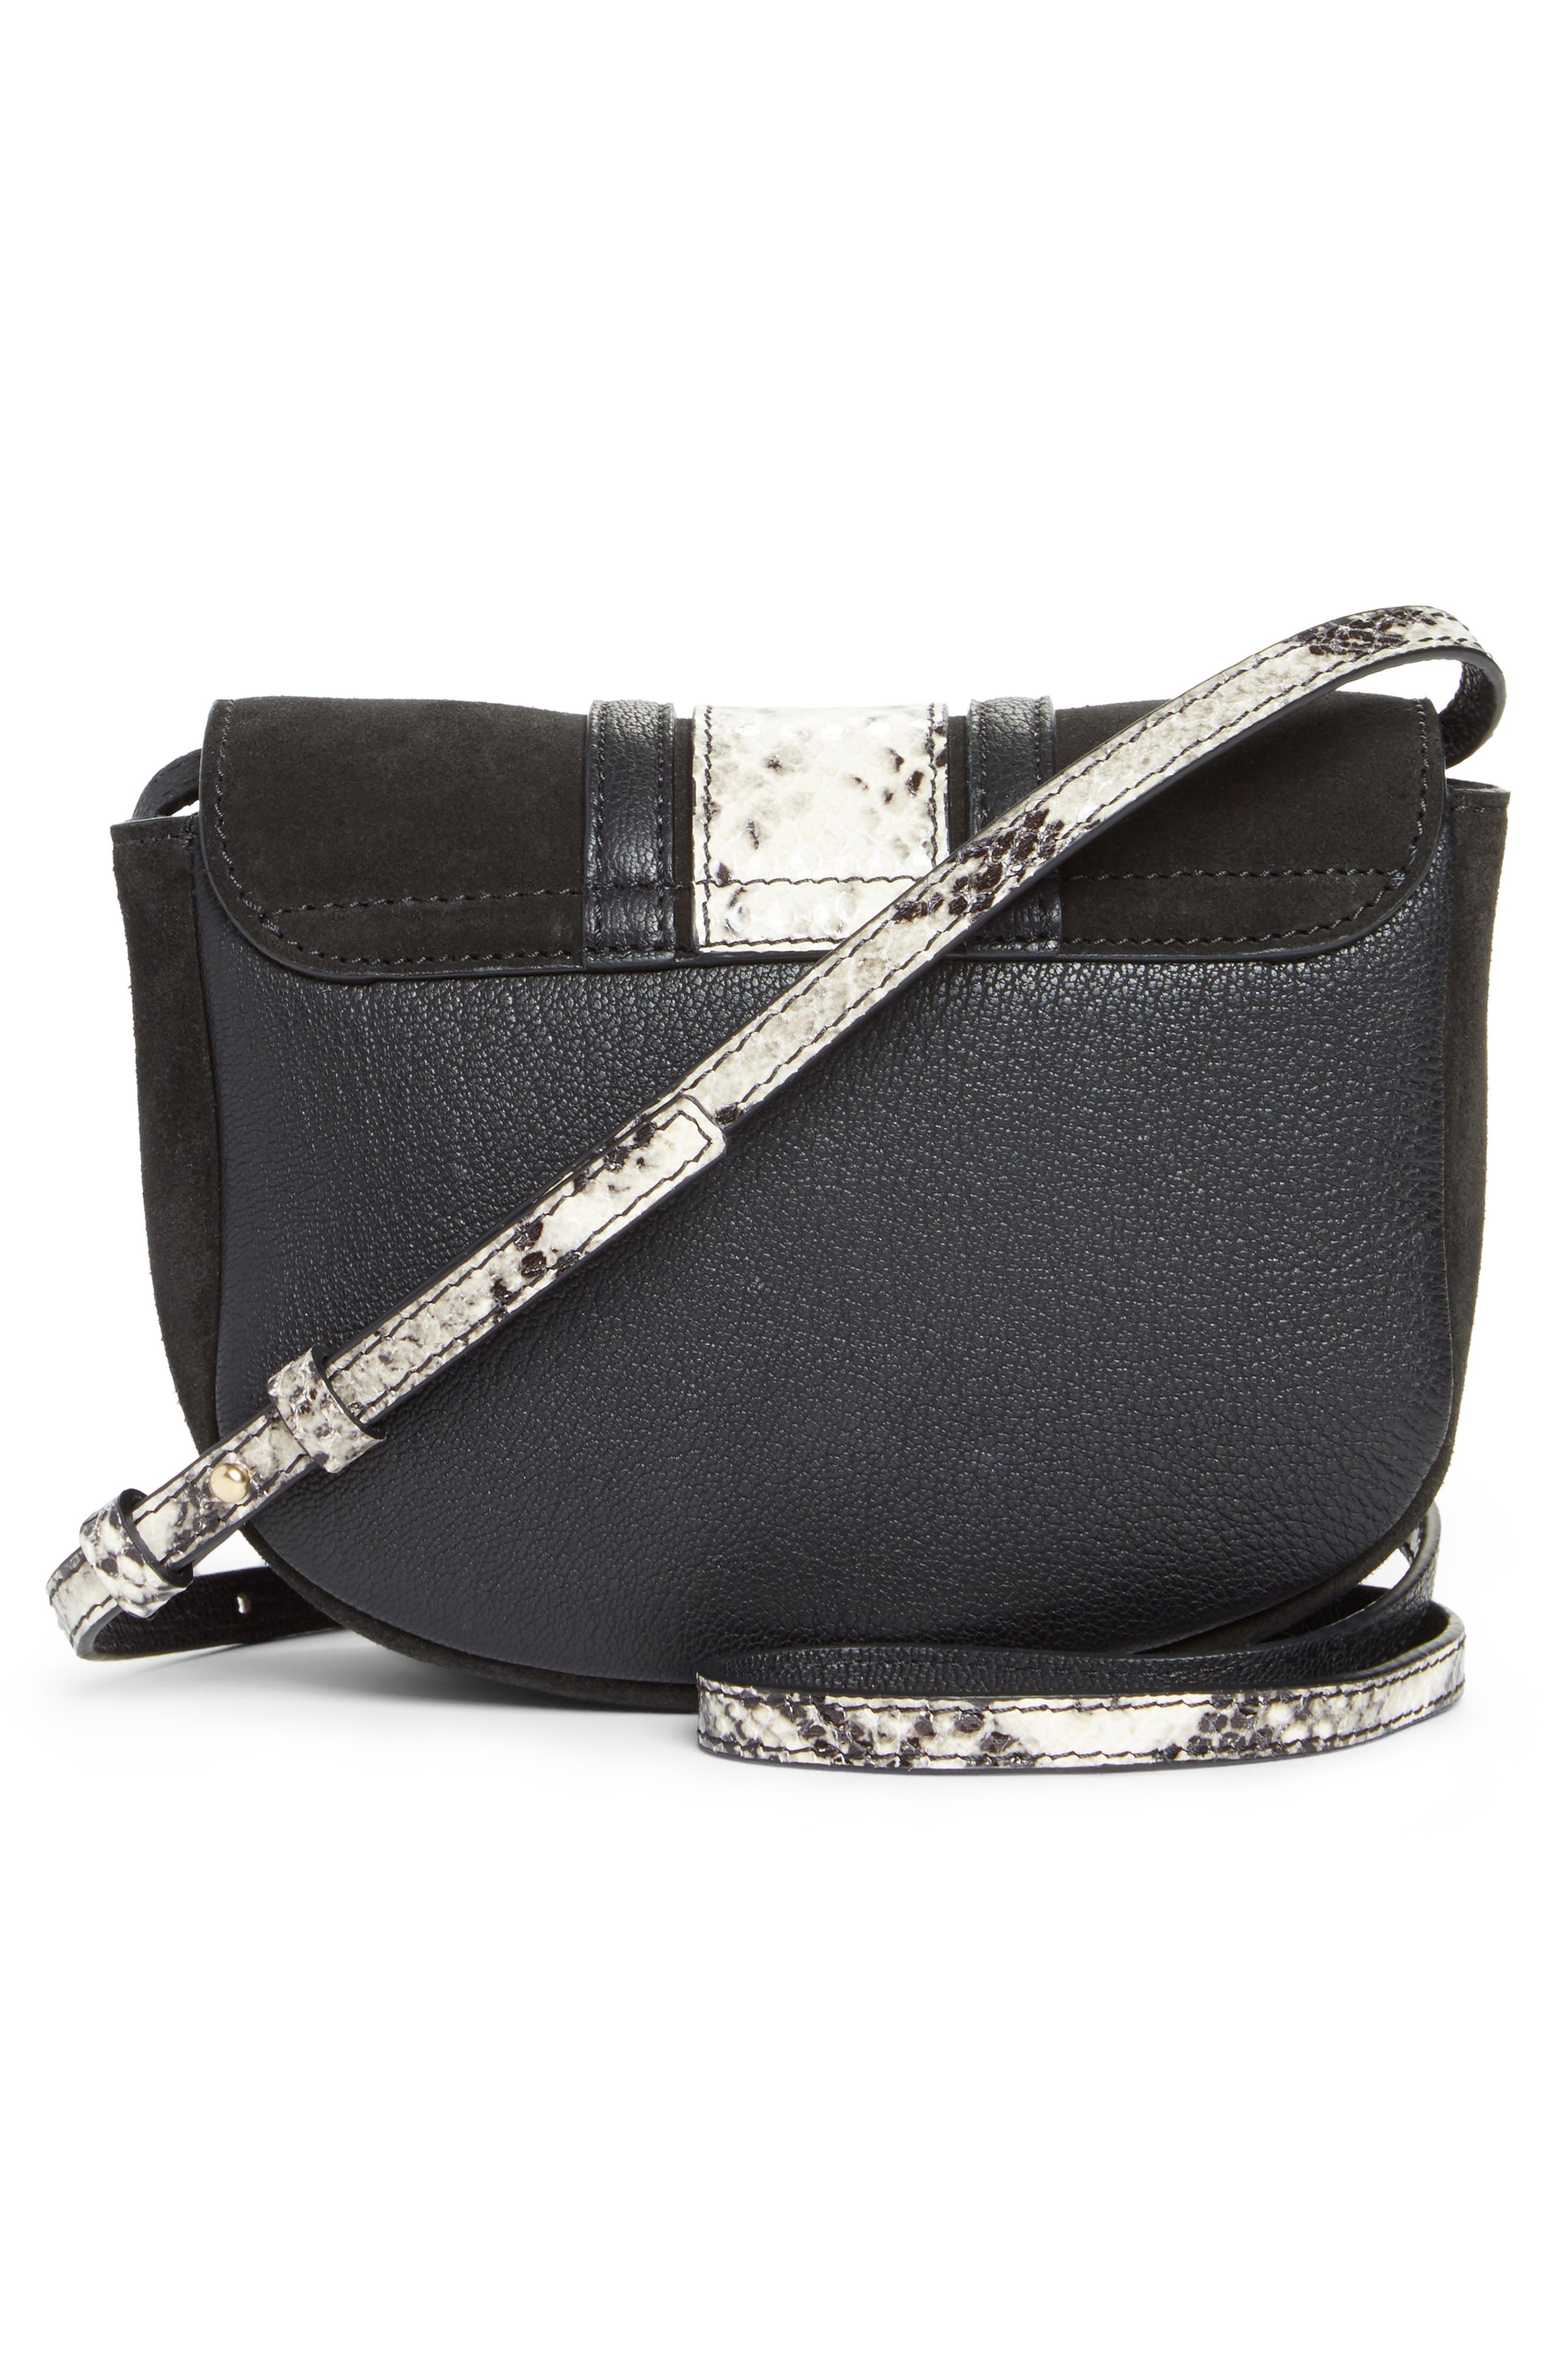 Alternate Image 3  - See by Chloé Mini Hana Leather Crossbody Bag